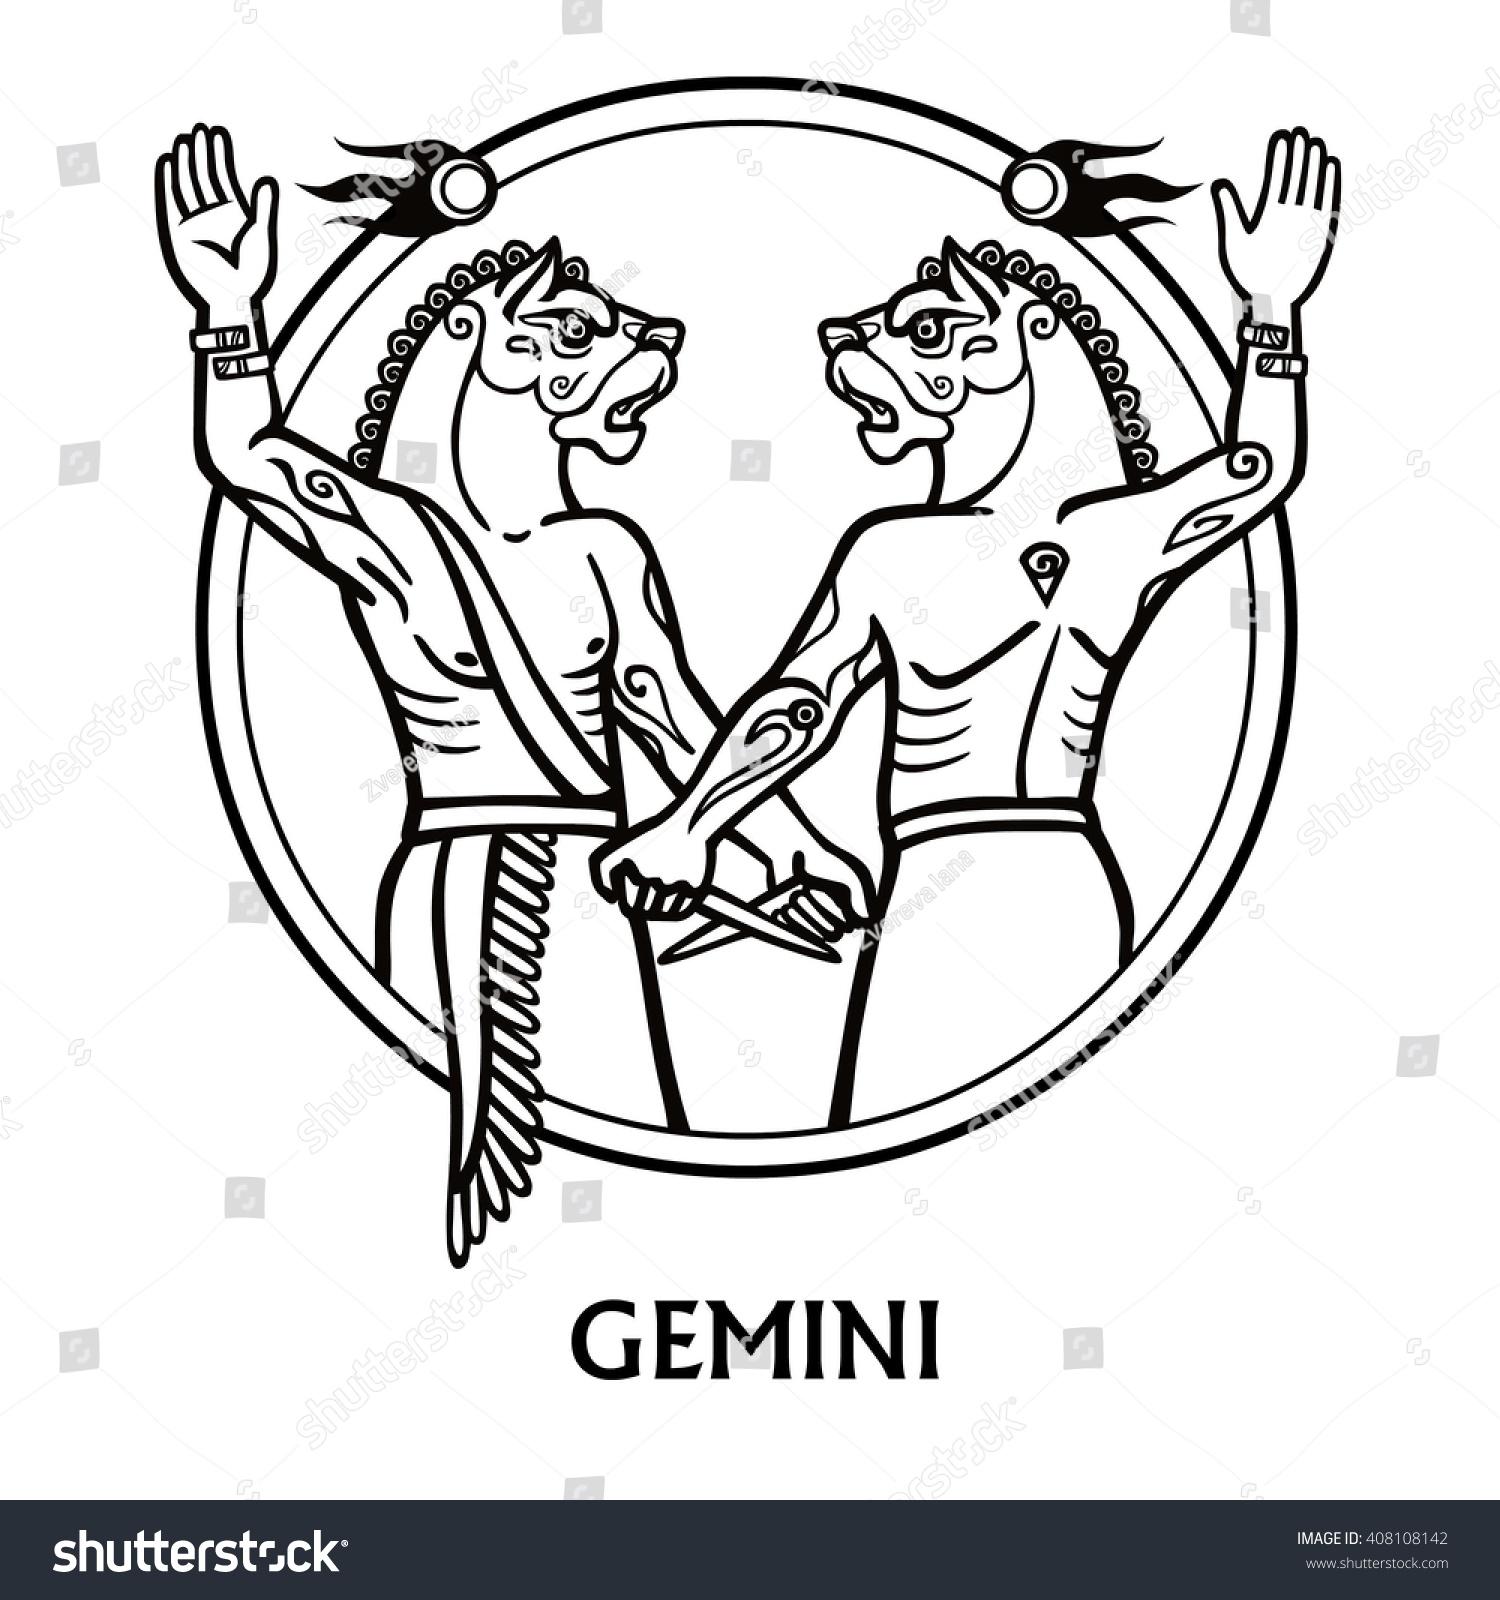 Zodiac Sign Gemini Vector Art Black Stock Vector 408108142 ...